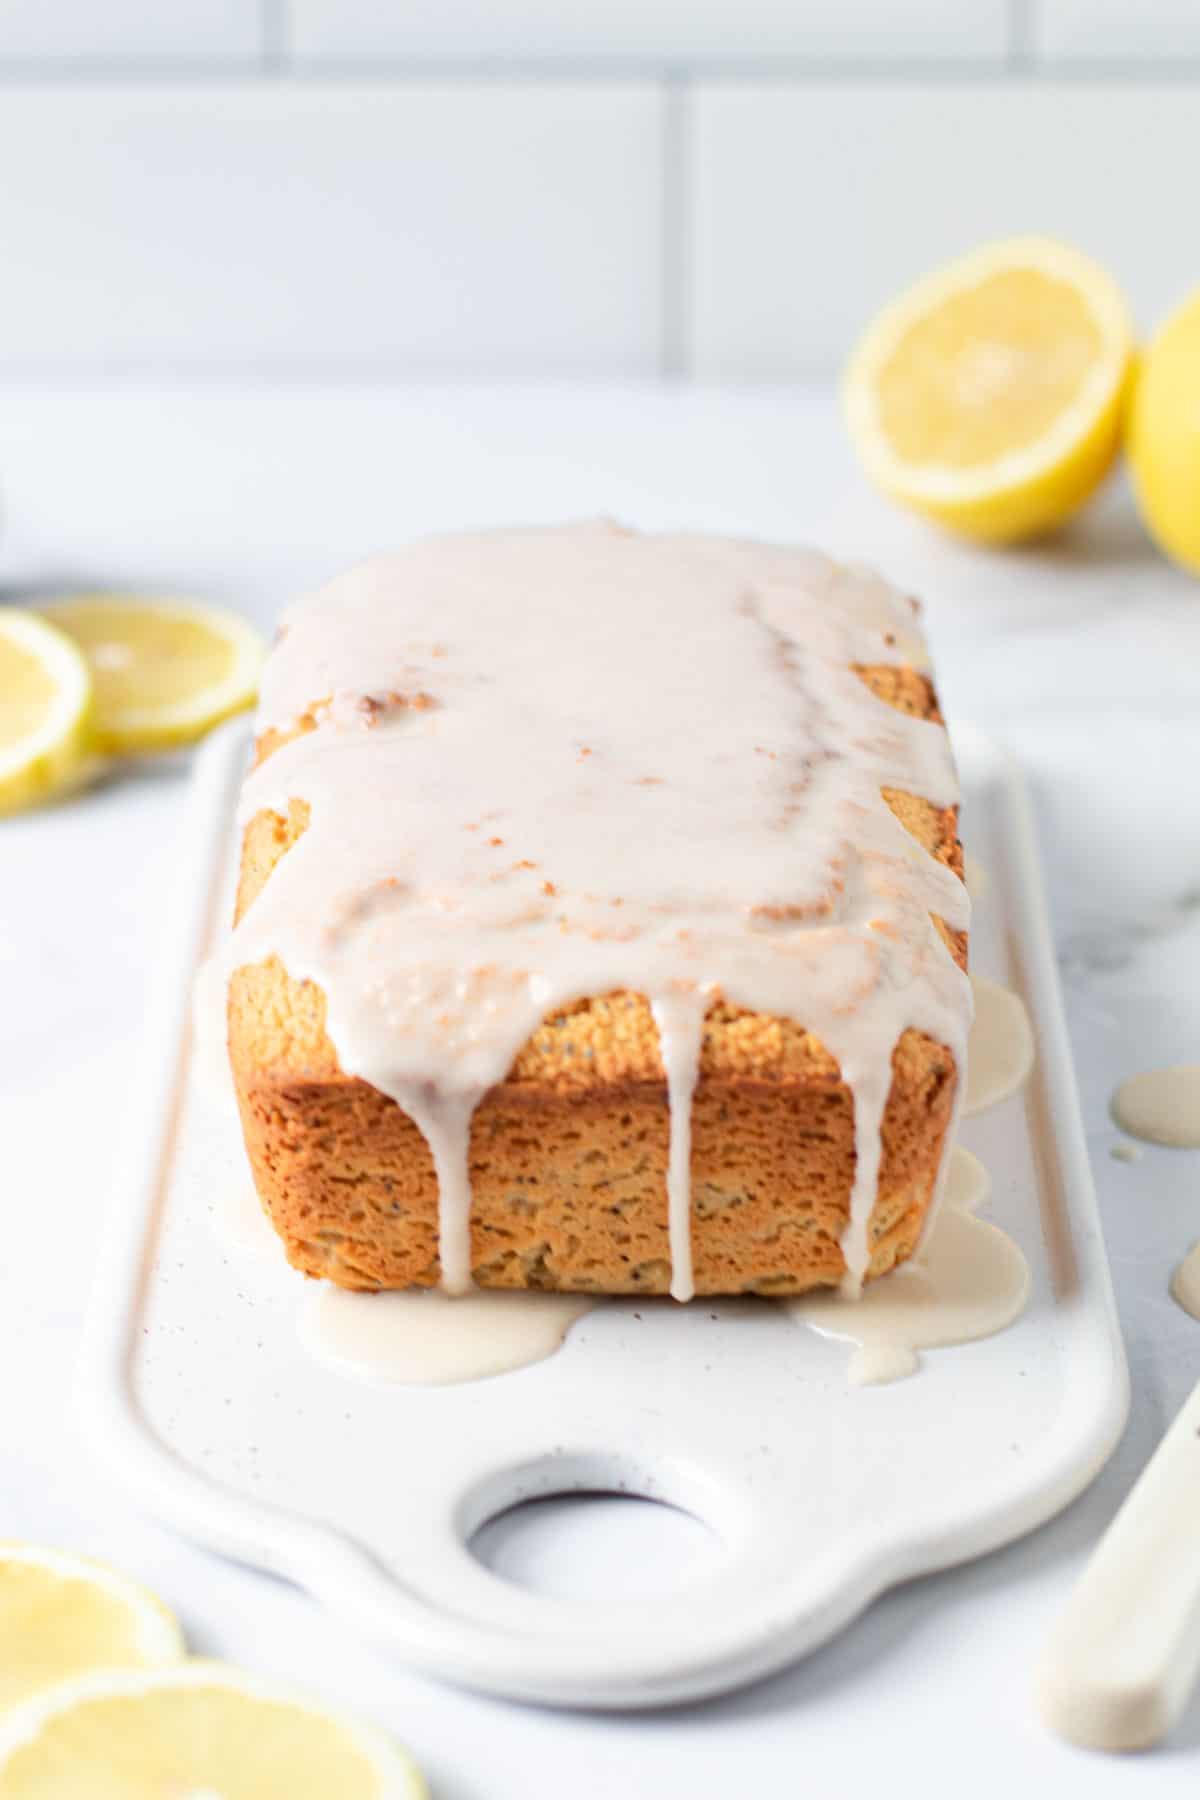 Glazed lemon poppy seed bread.